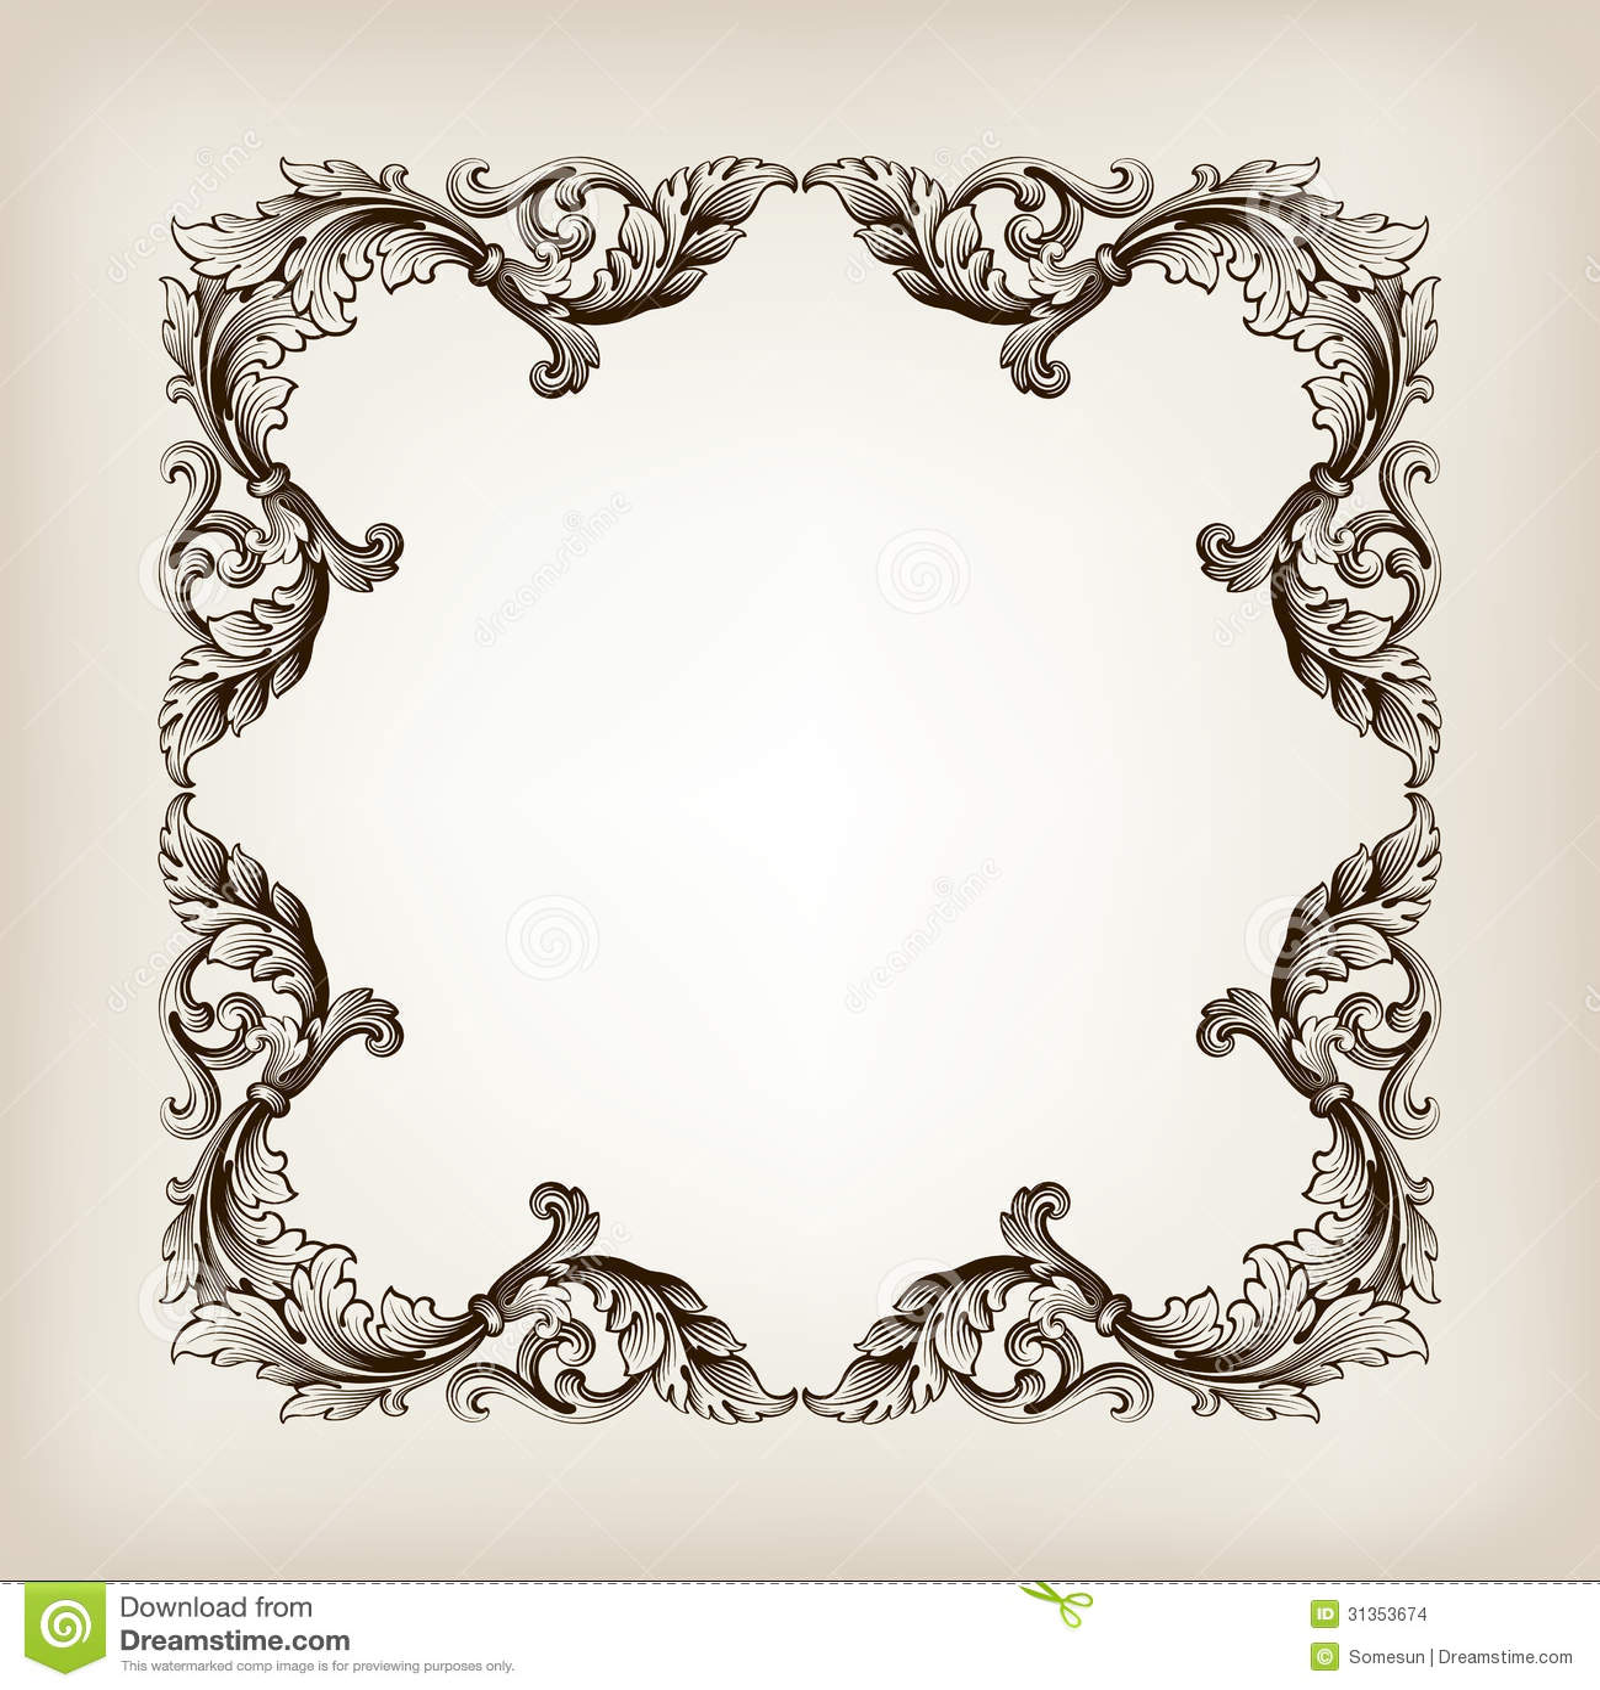 Antique Border: Vintage Border Frame Calligraphy Engraving Baroque Stock